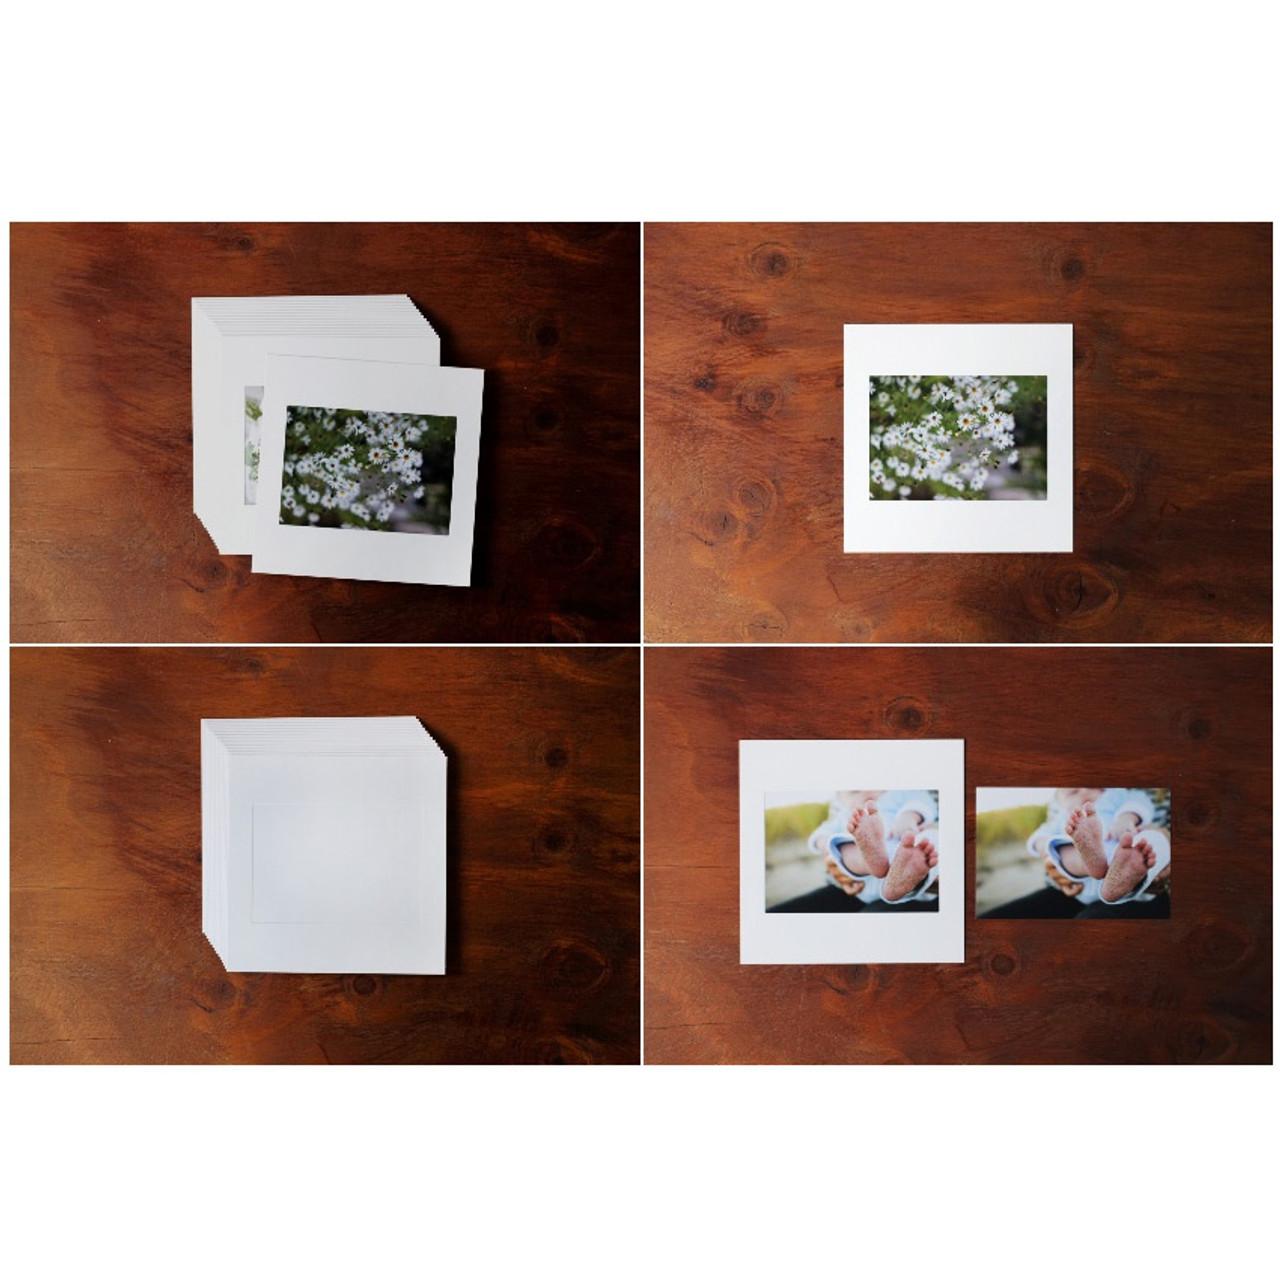 moods views square 4x6 white paper photo frame set of 15 sheets. Black Bedroom Furniture Sets. Home Design Ideas